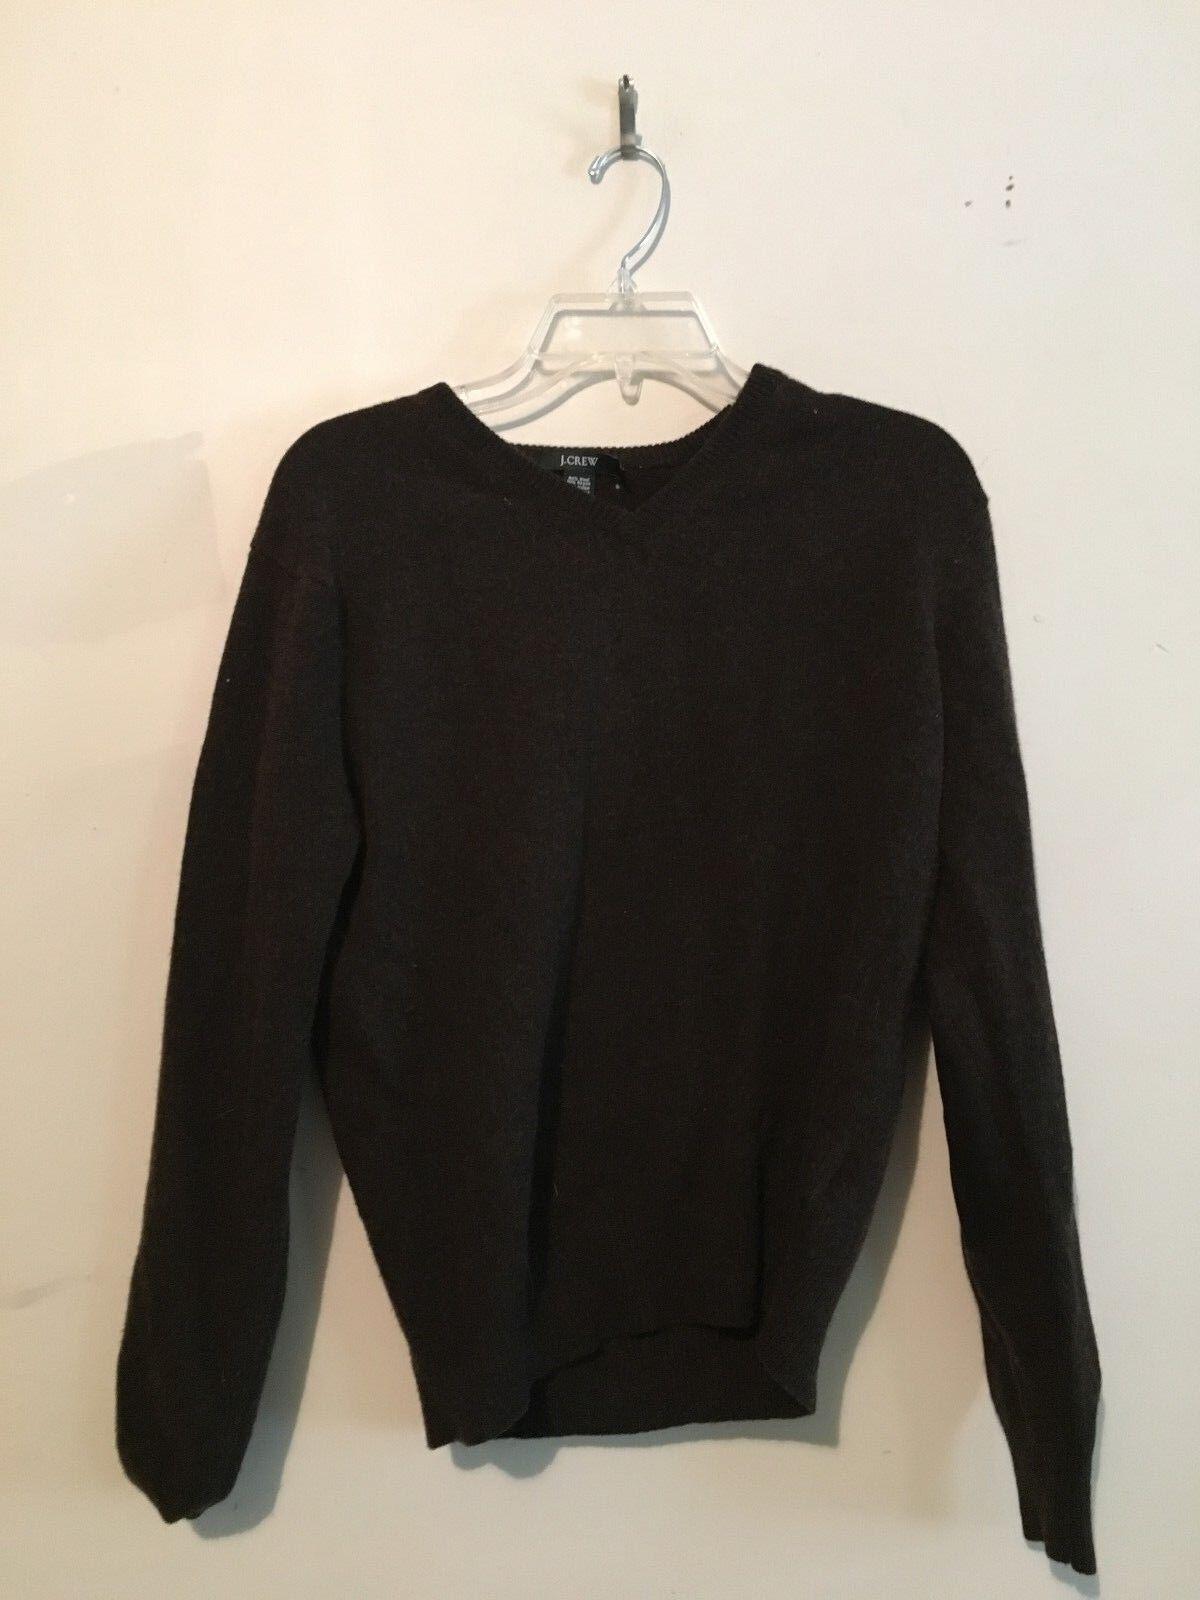 J.CREW Chestnut Brown Wool Cashmere Cashmere Cashmere Angora Blend Women Sweater Top Size S 2f596b